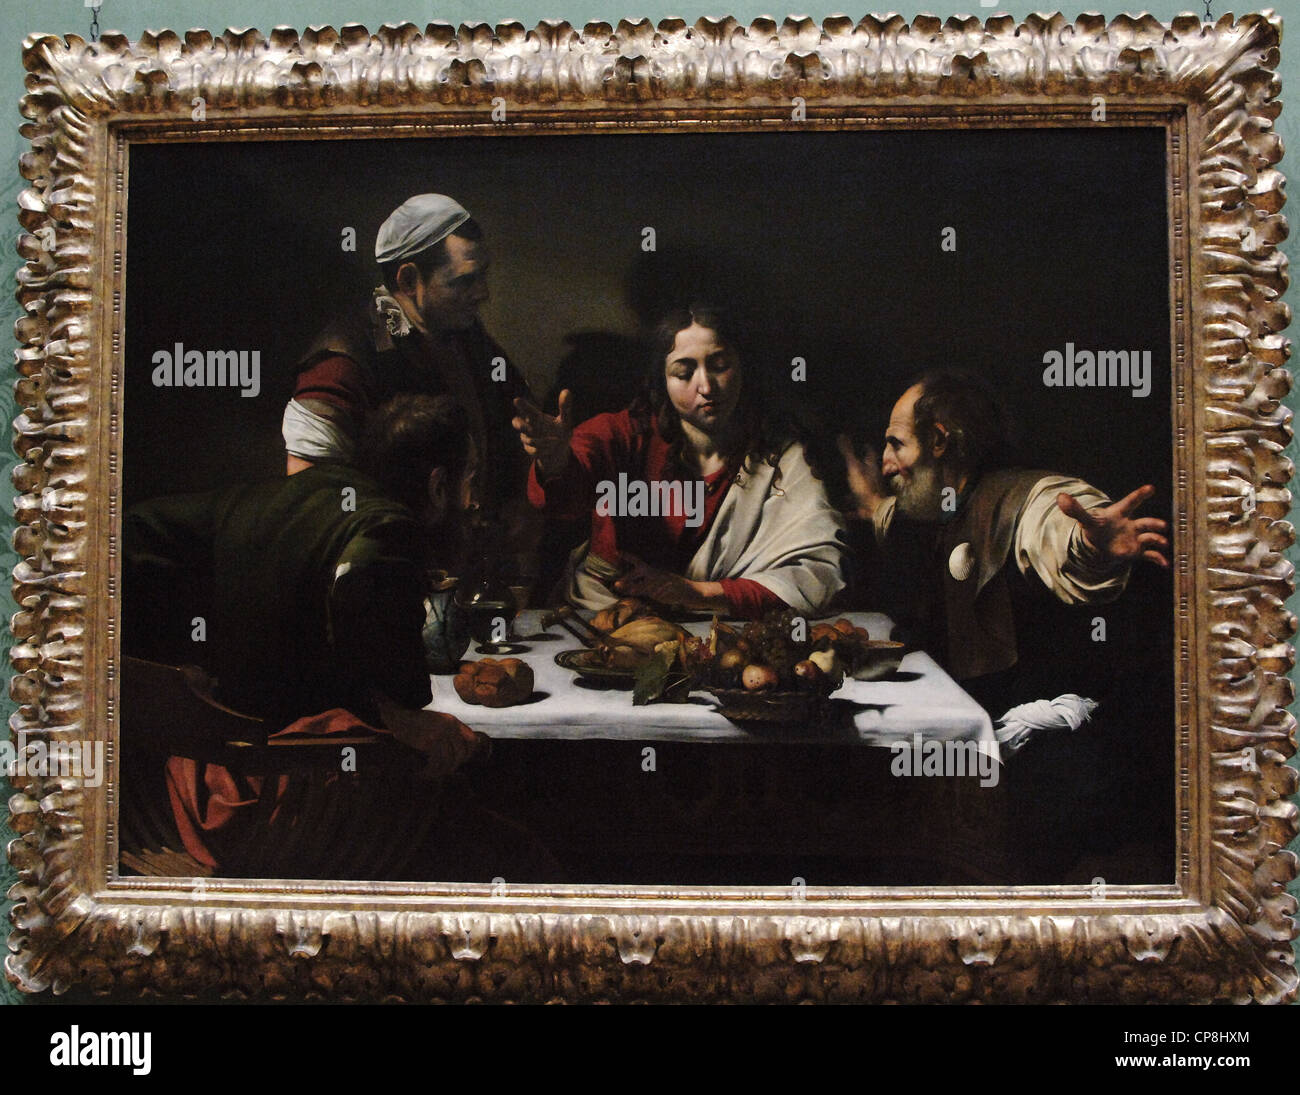 Baroque Art. Italy. Michelangelo Merisi da Caravaggio (1571-1610). Italian painter. Supper at Emmaus (1601). Oil - Stock Image